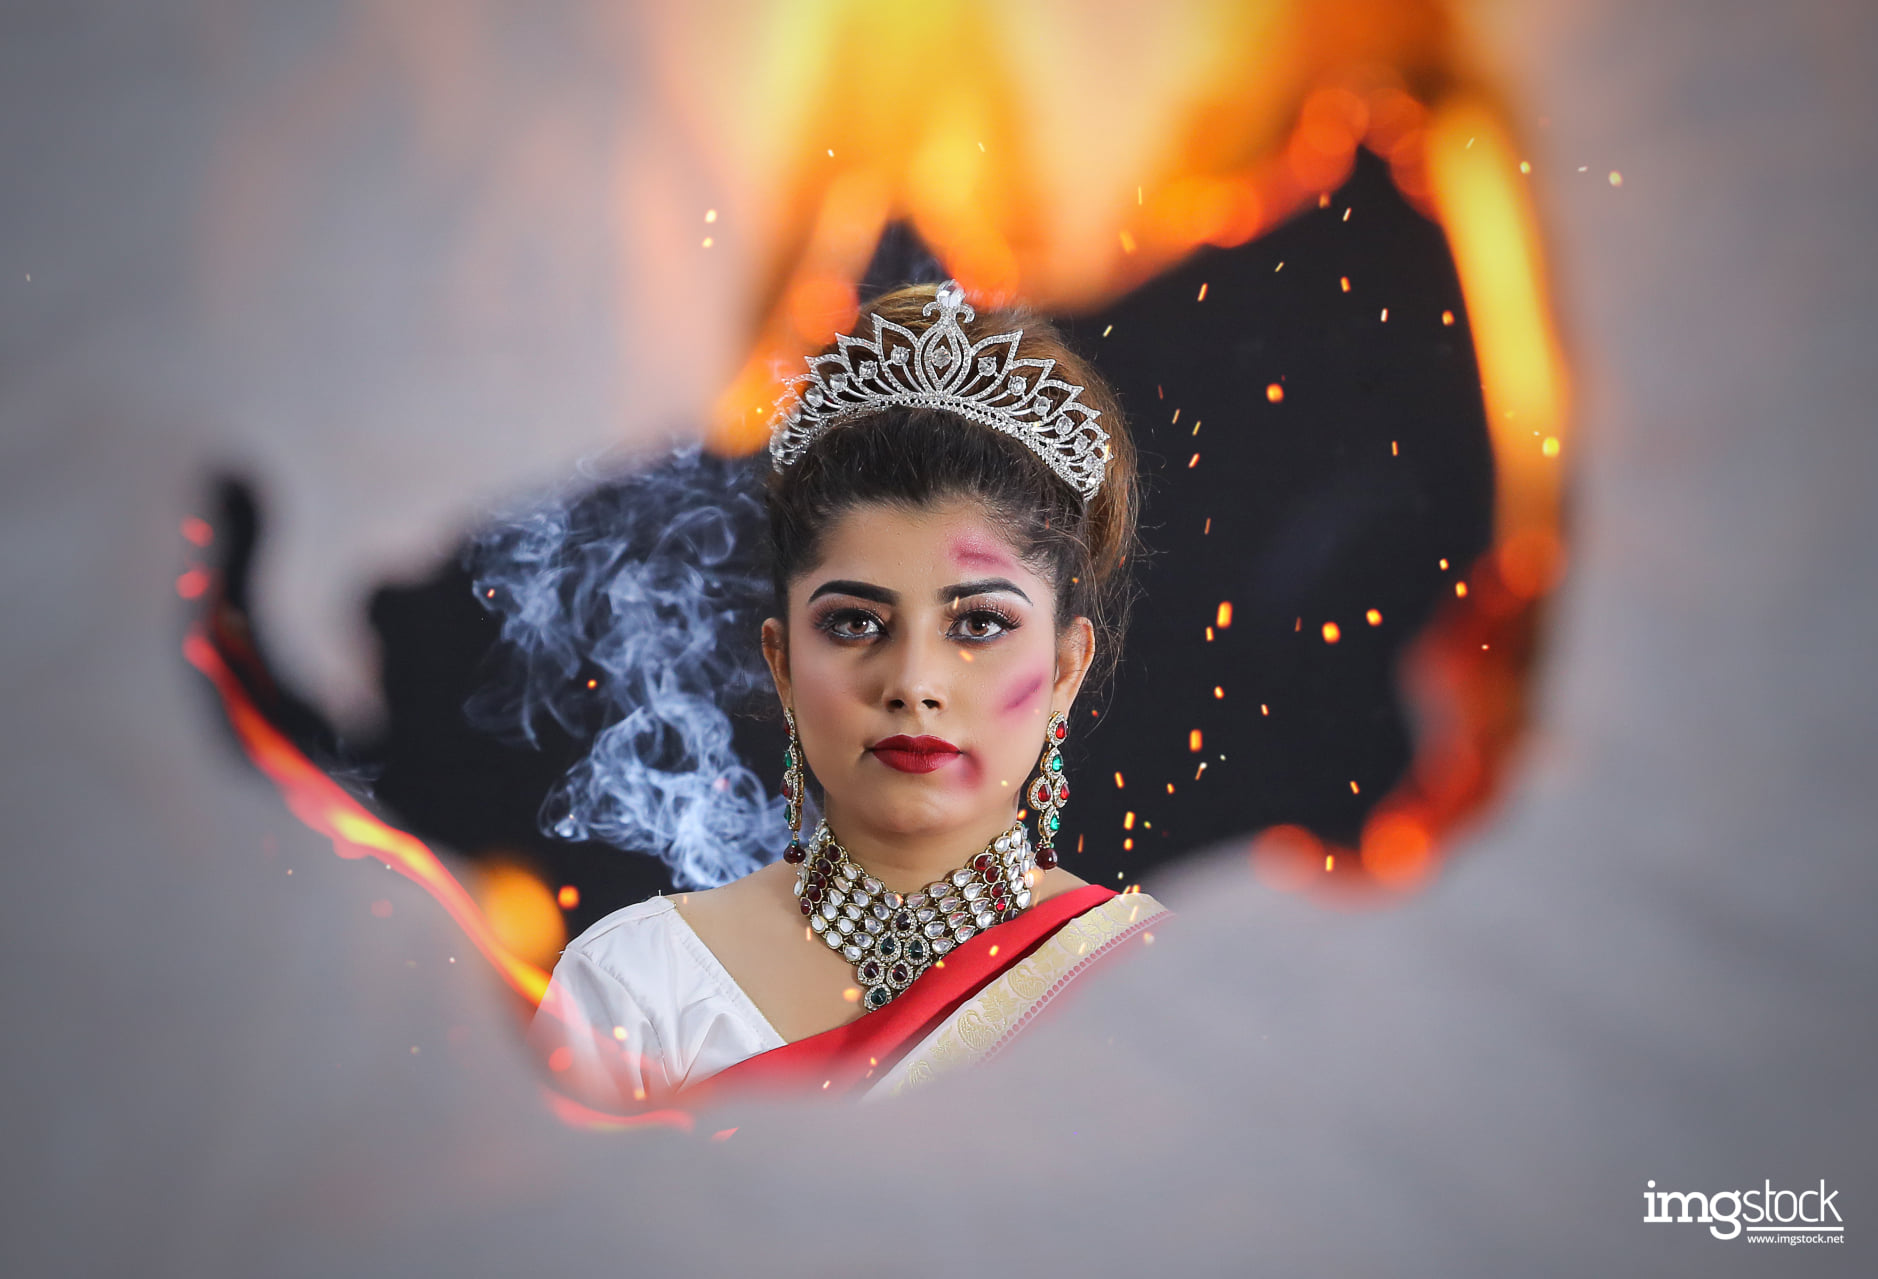 Sanju Sapkota - ImgStock, Best Photography in Biratnagar